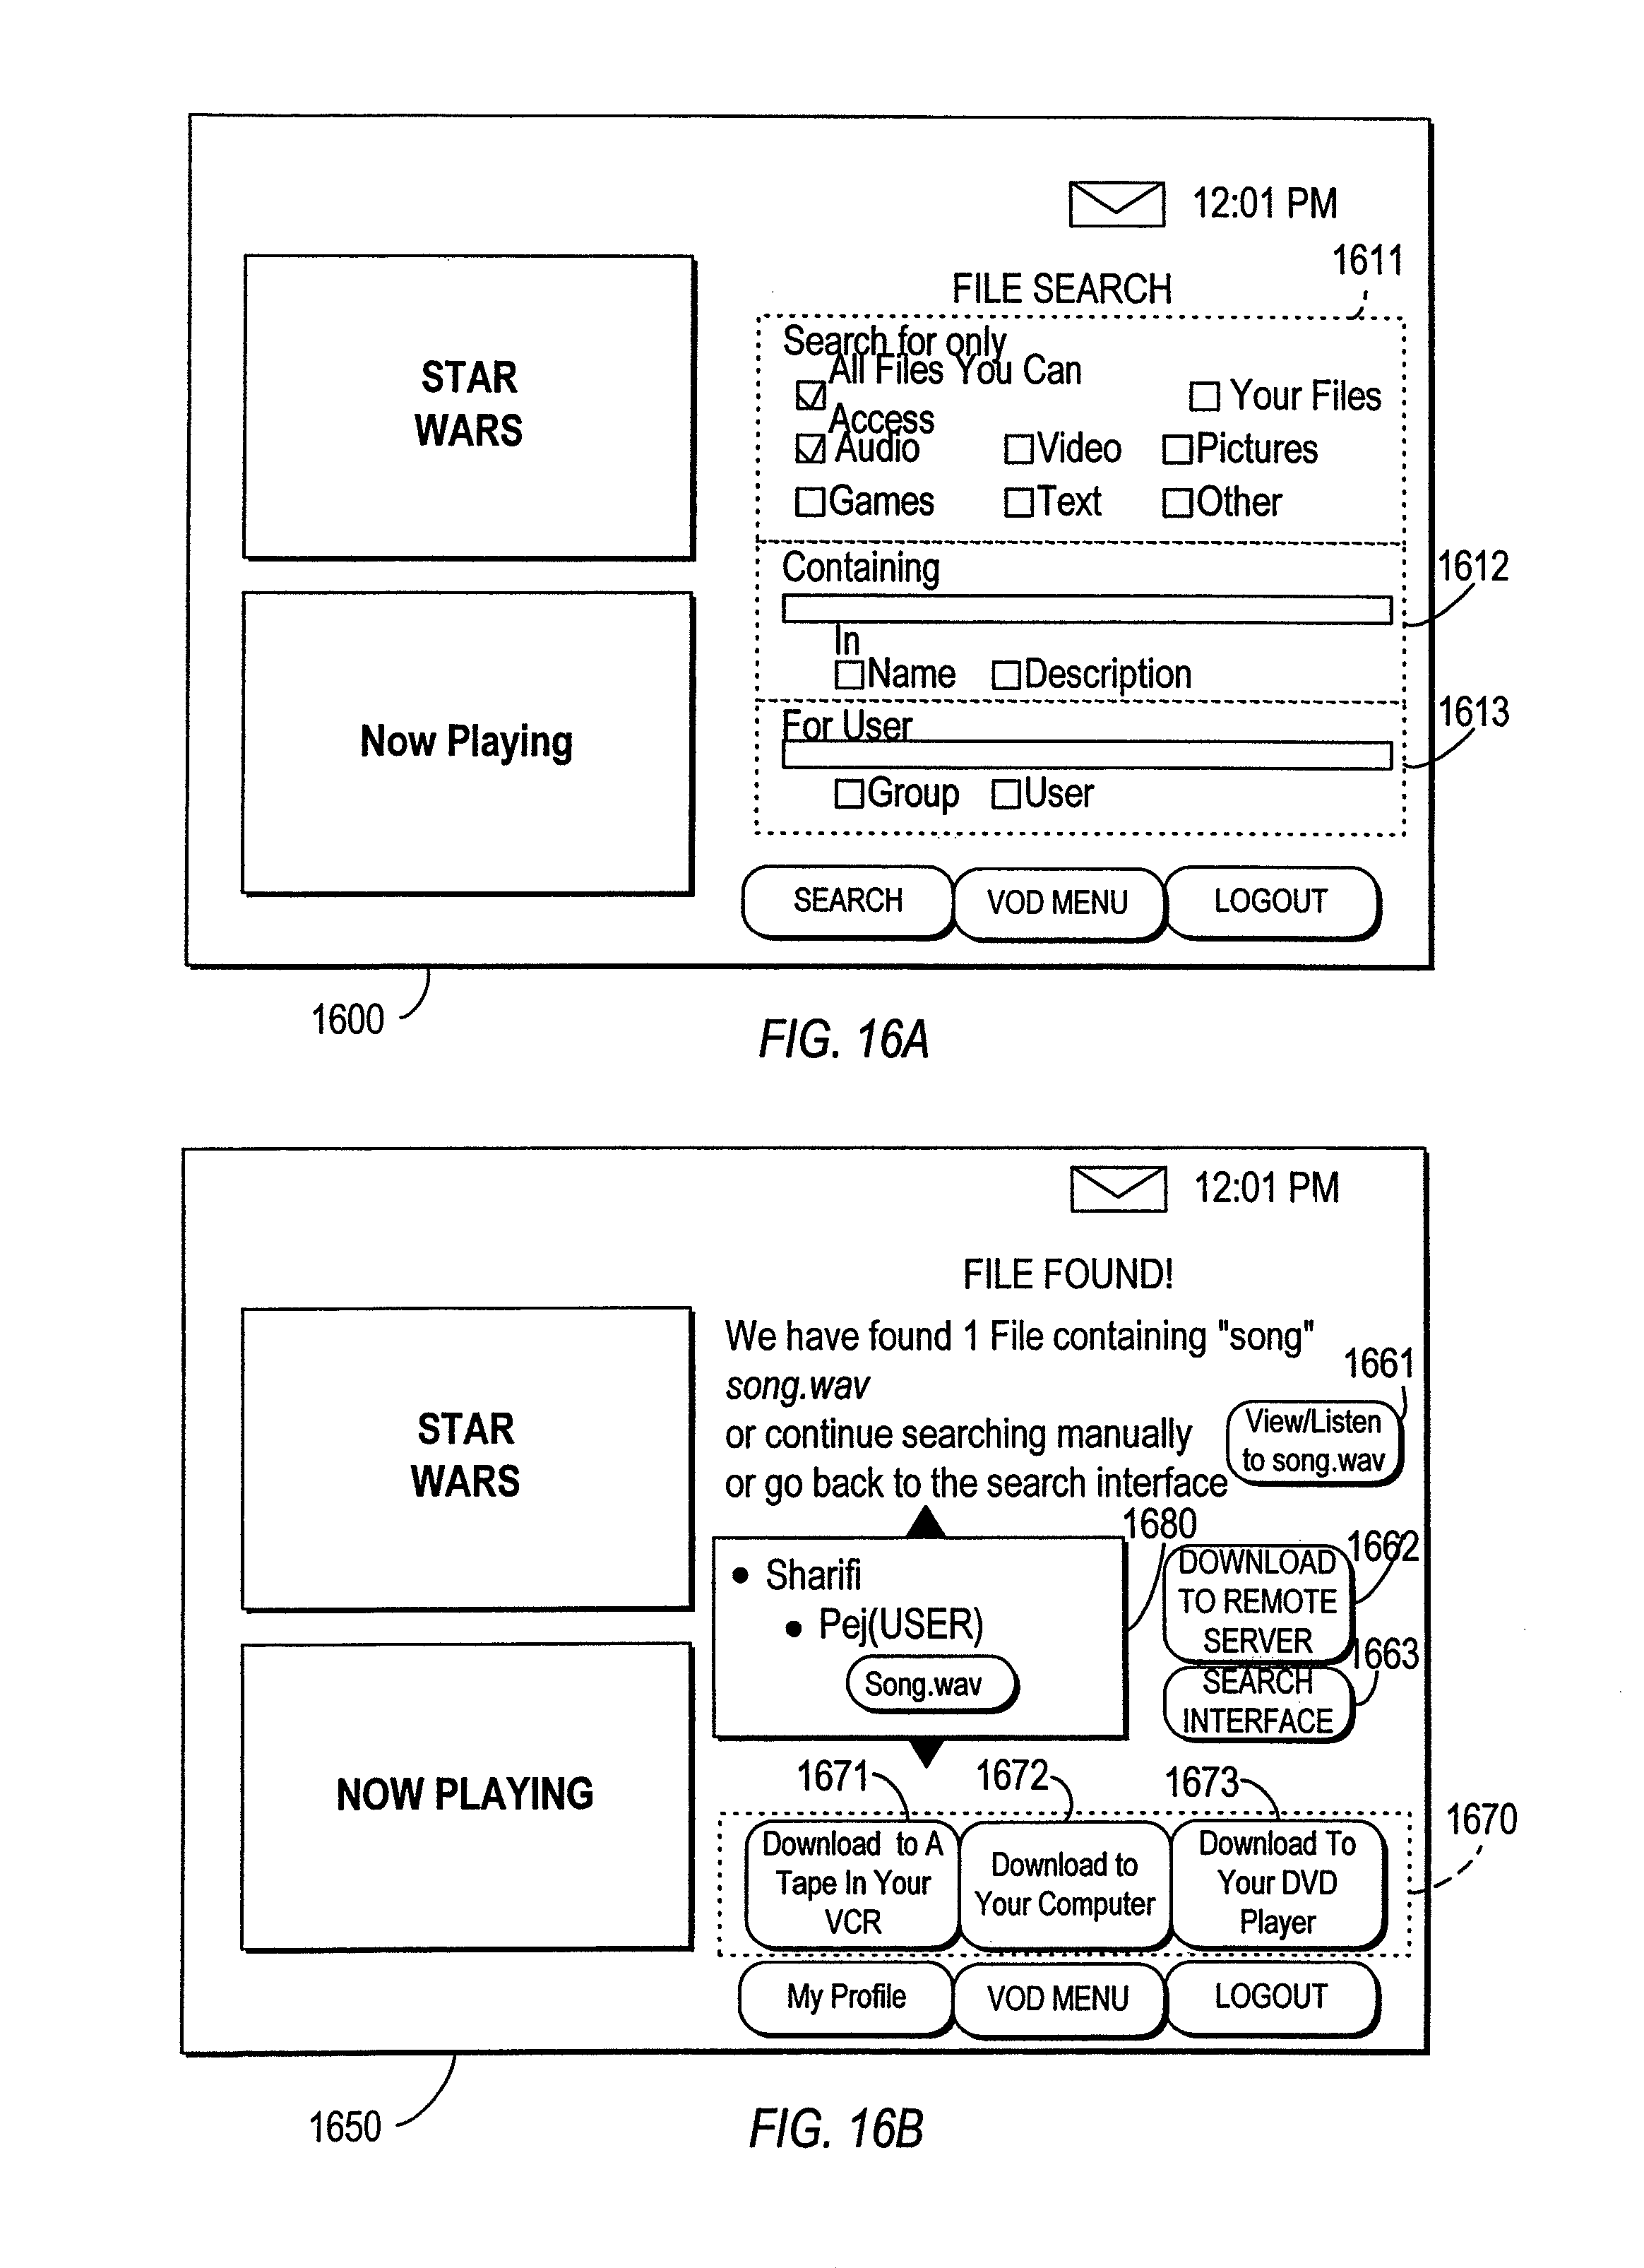 Patent US 9,294,799 B2